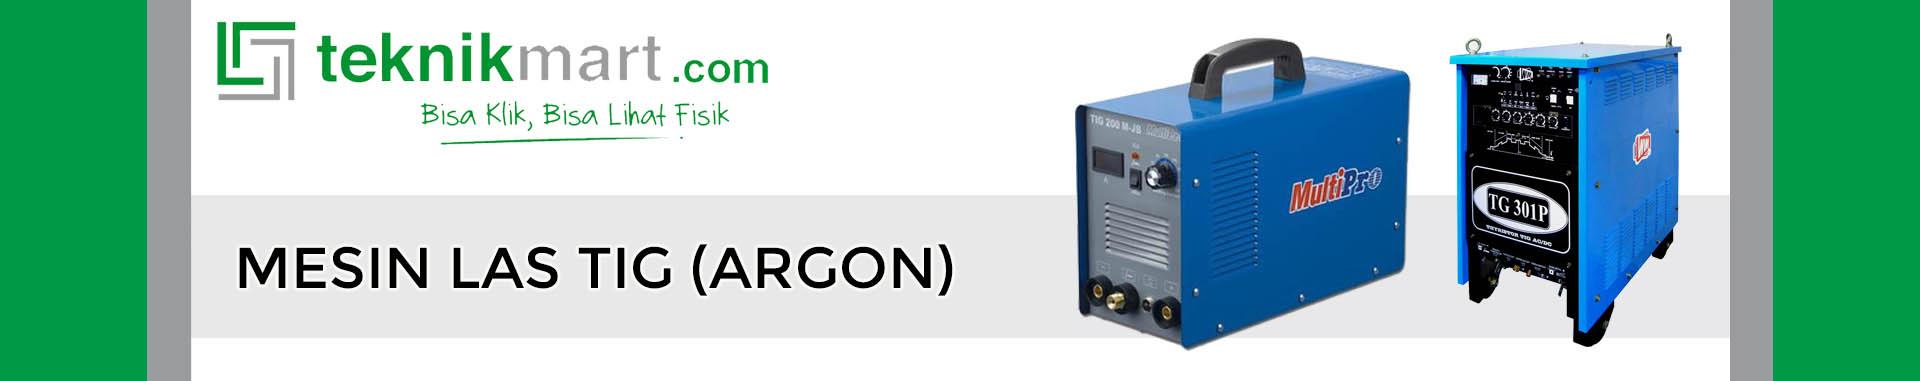 Mesin Las TIG (Argon)